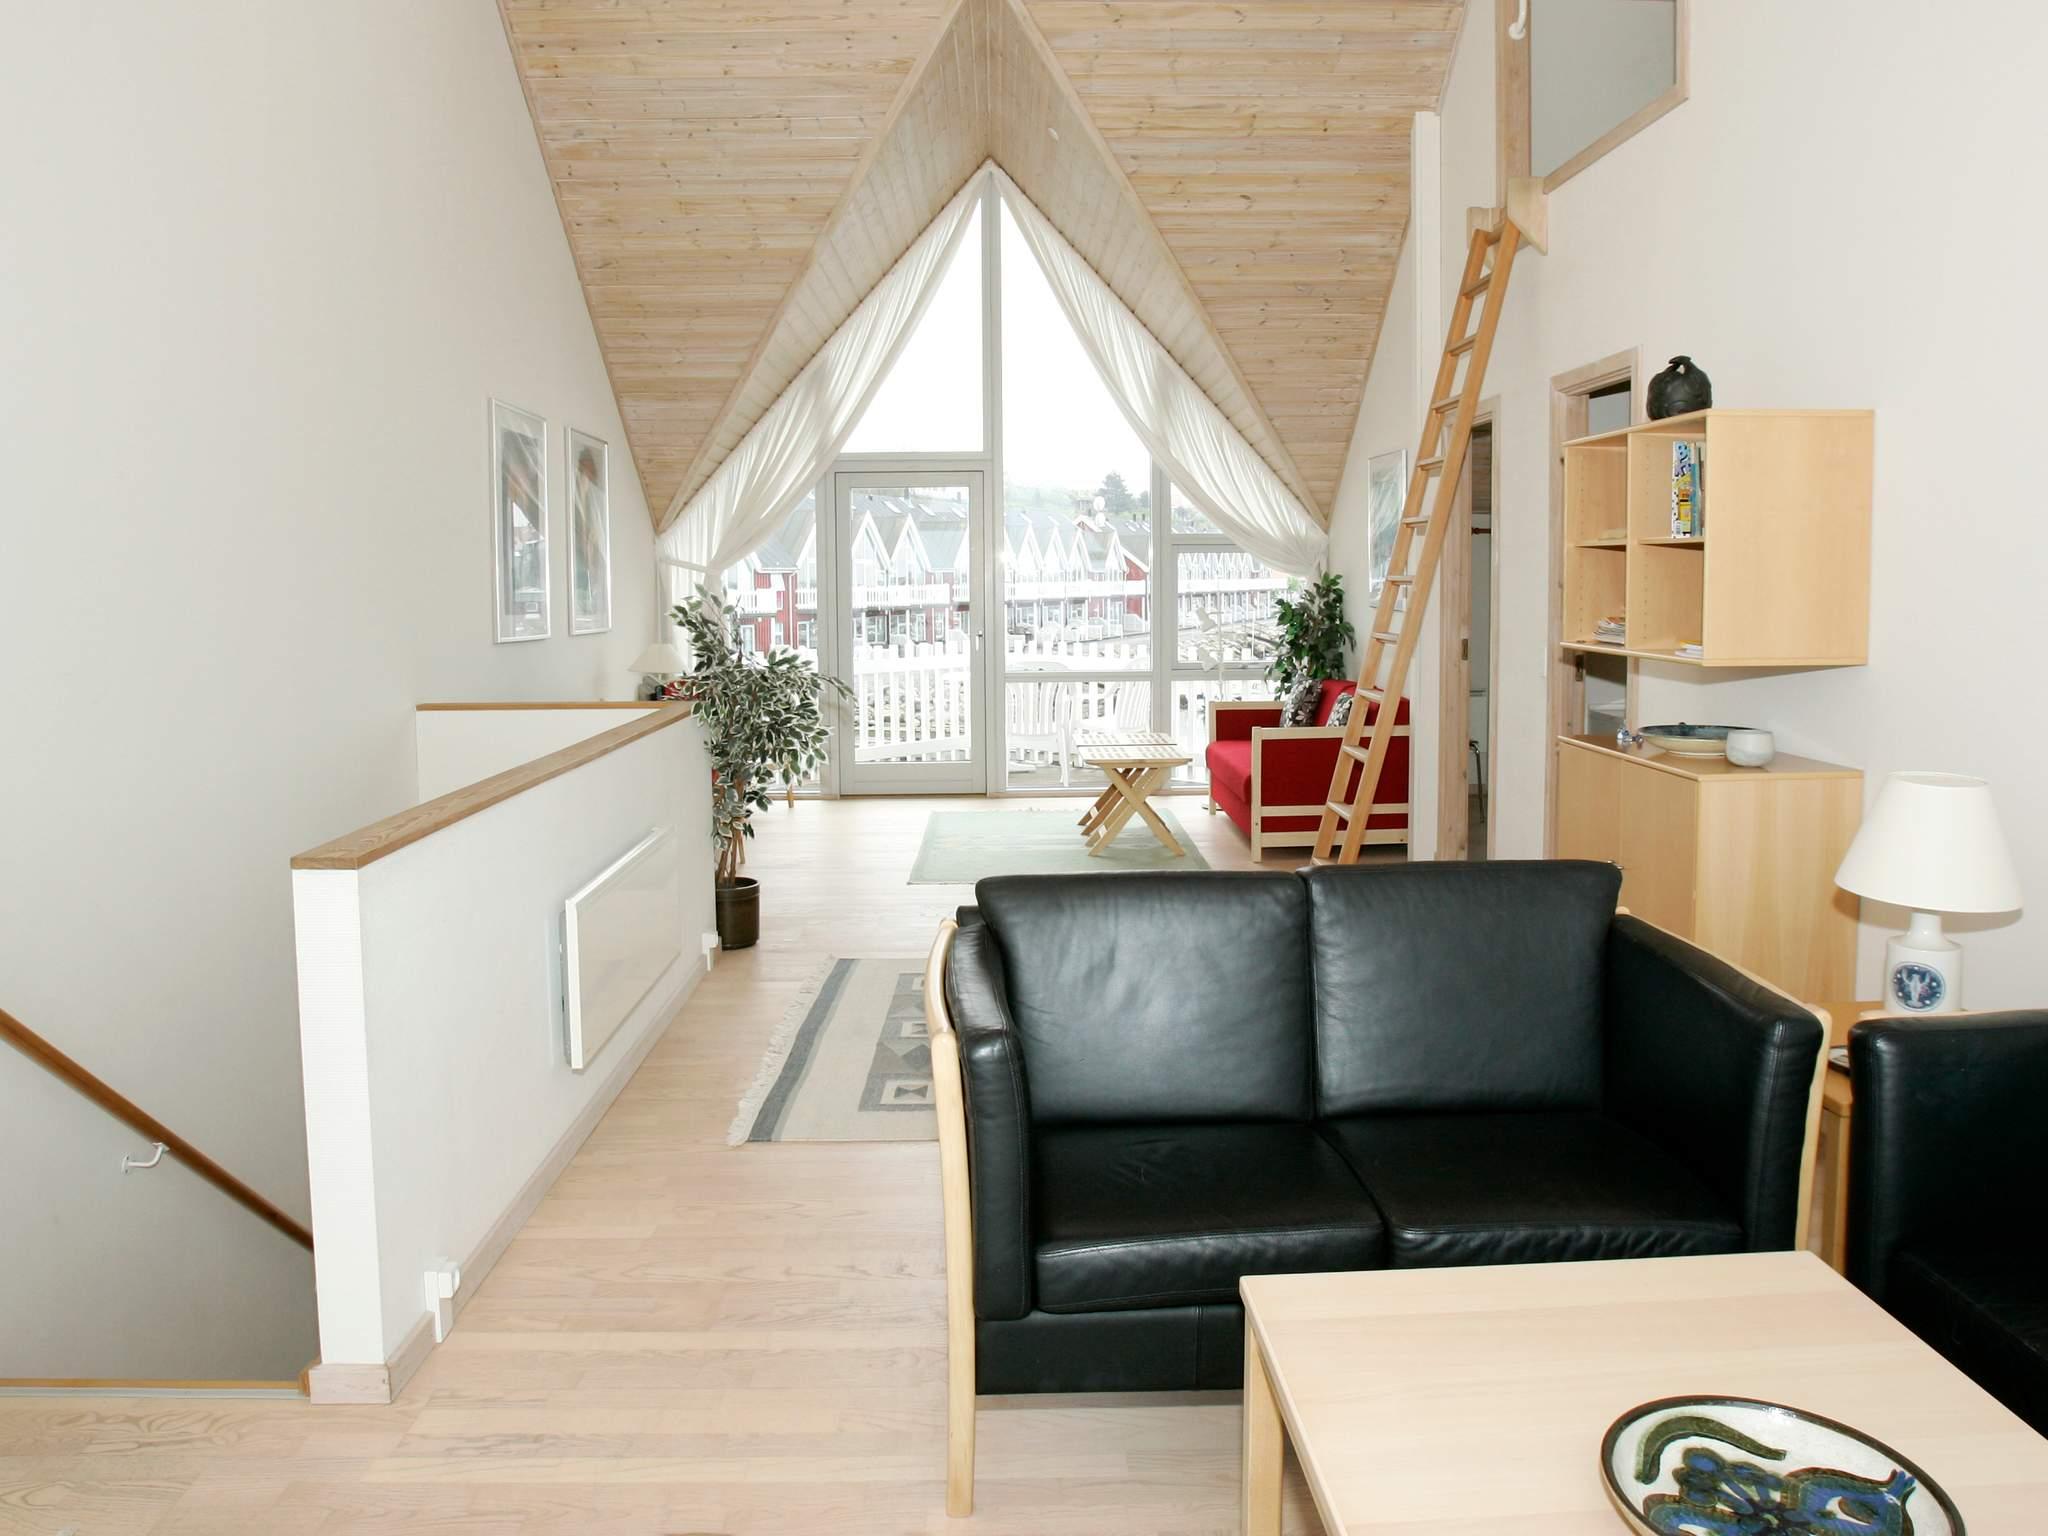 Ferienhaus Hasle (84885), Hasle, , Bornholm, Dänemark, Bild 4